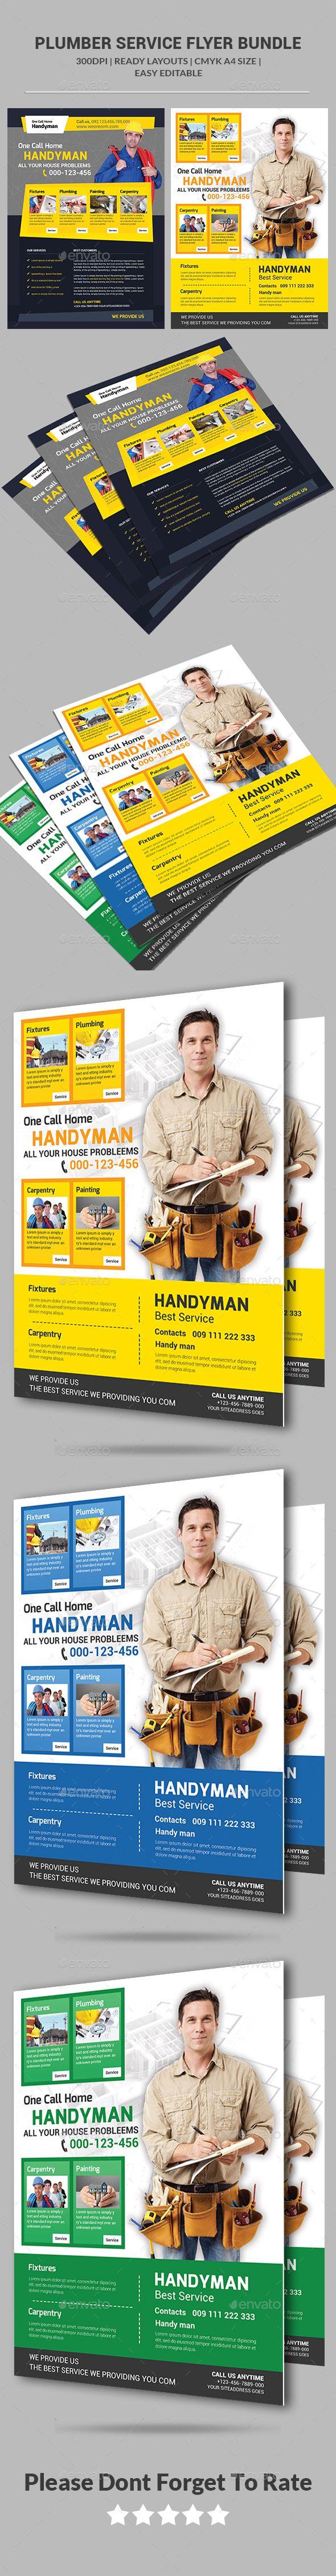 plumber service flyers bundle flyers plumber service flyers bundle